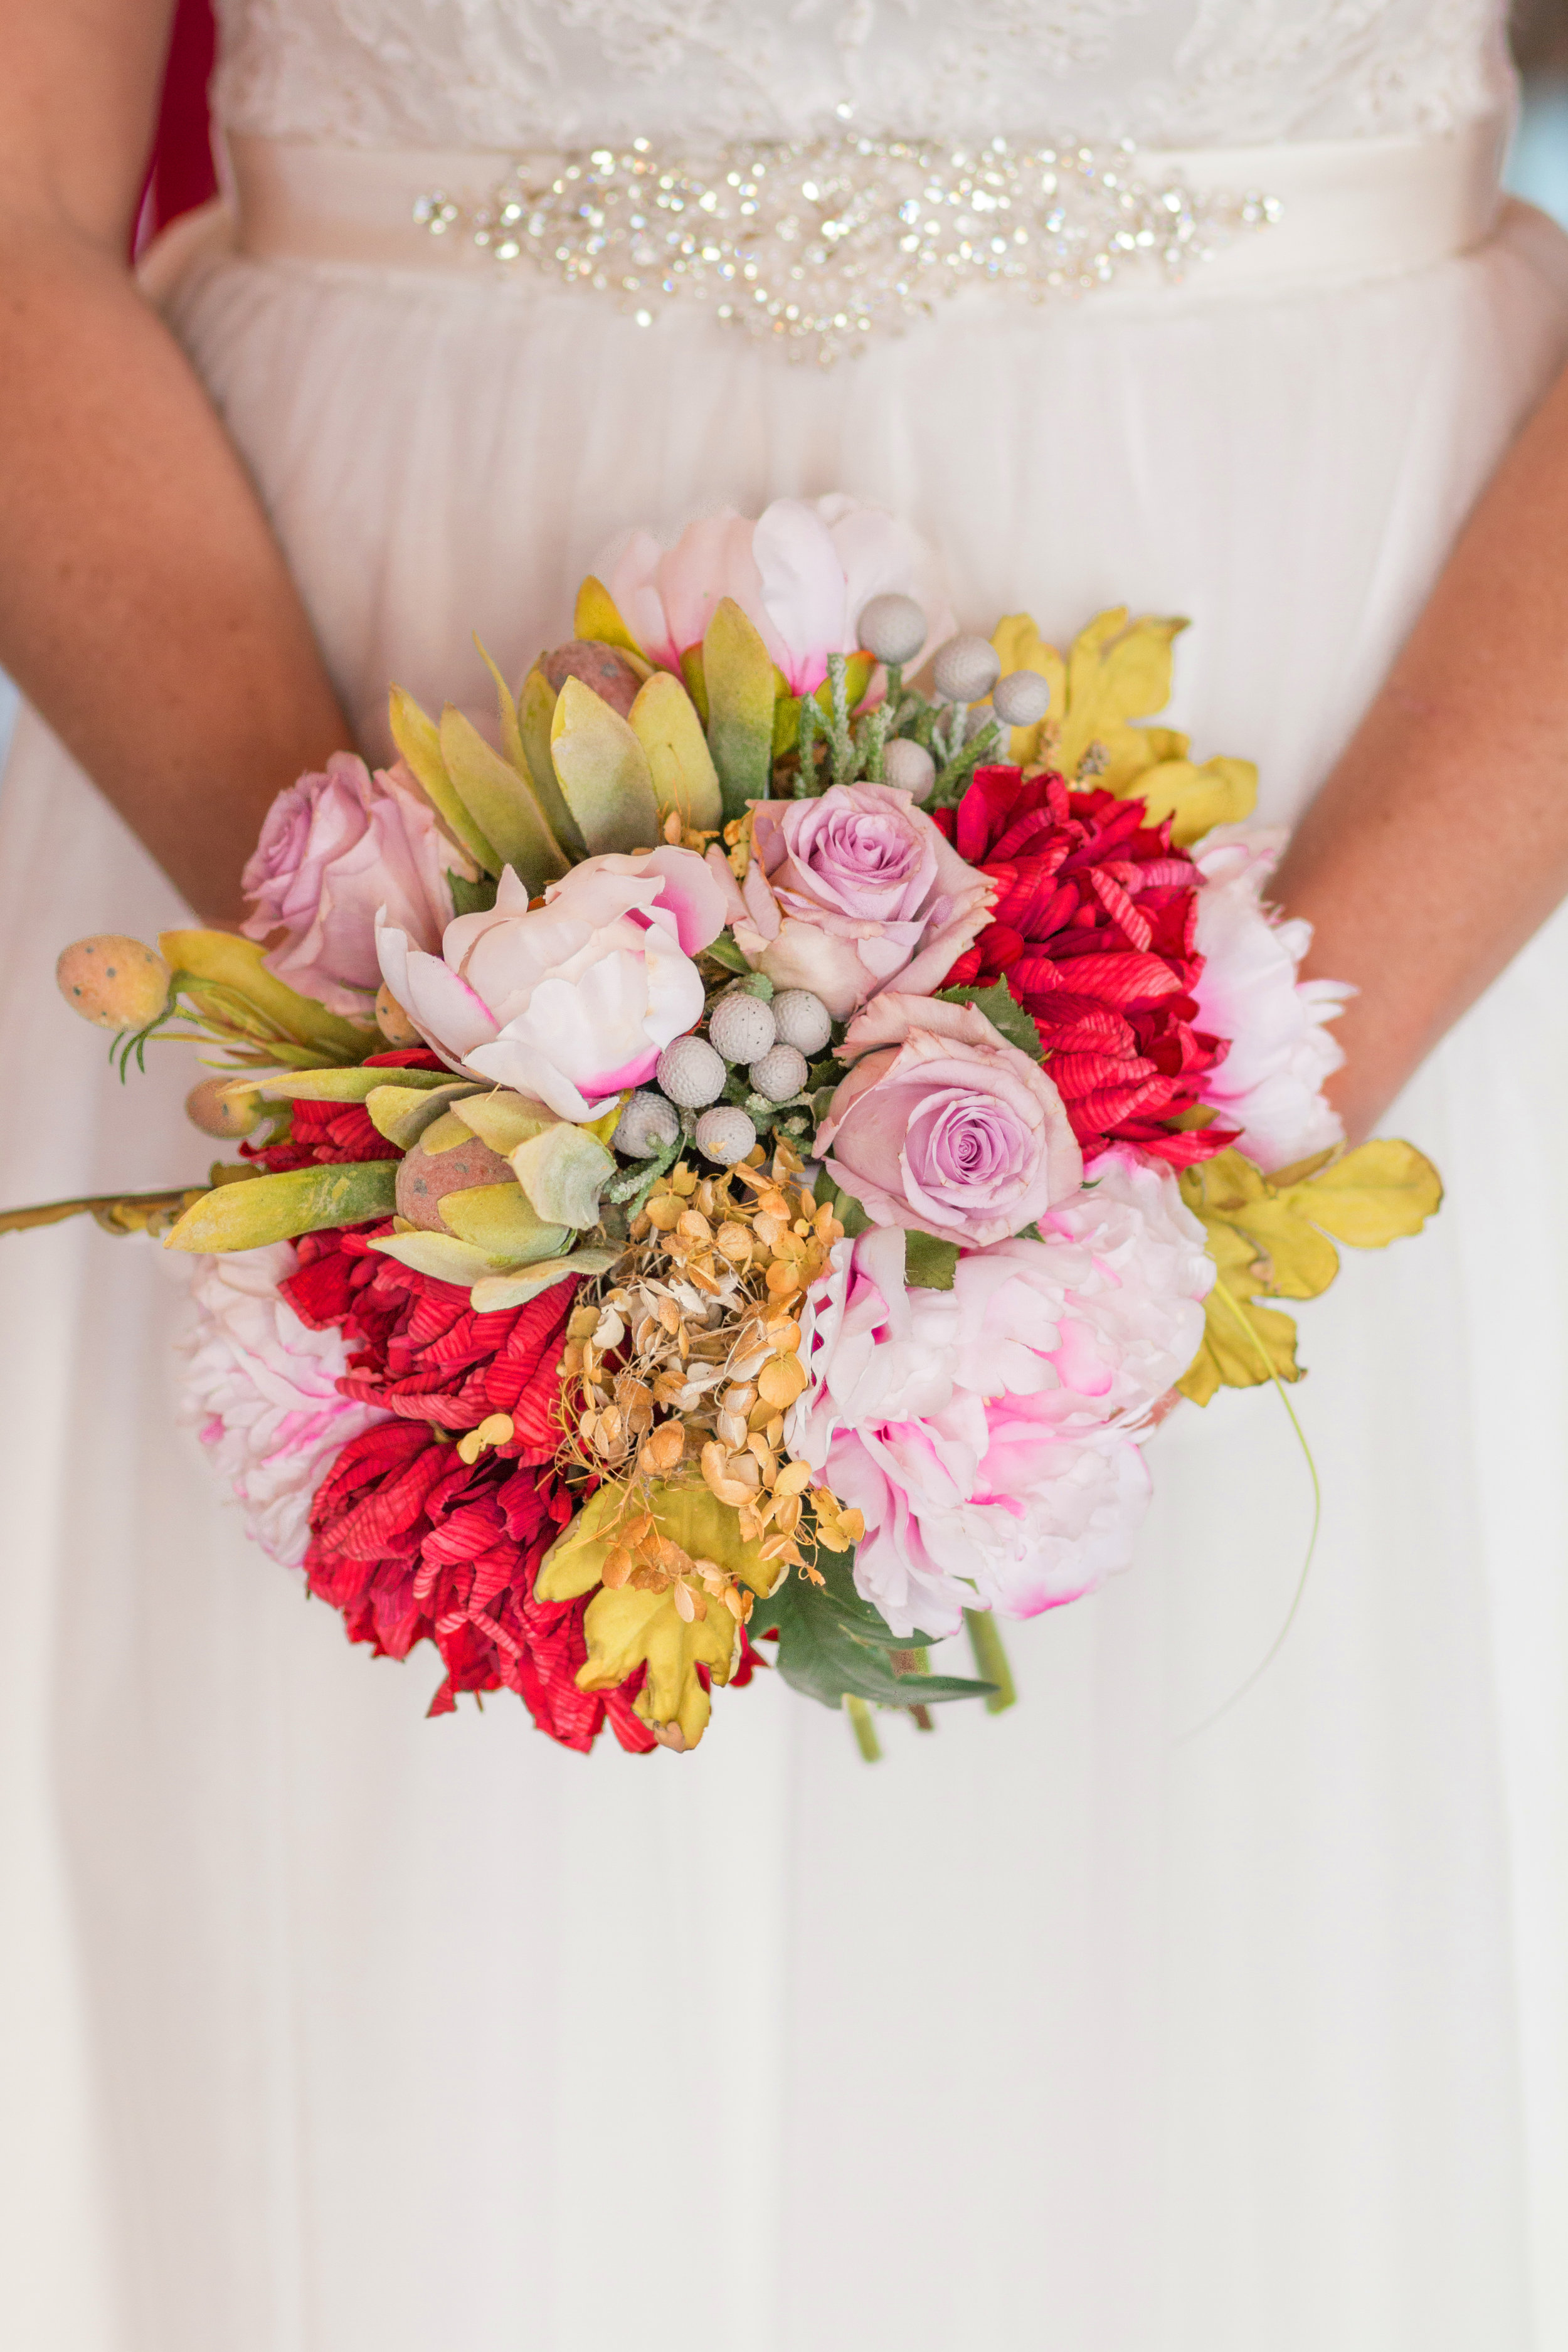 Rugged Horizon - Winter Wedding Dress & Flowers